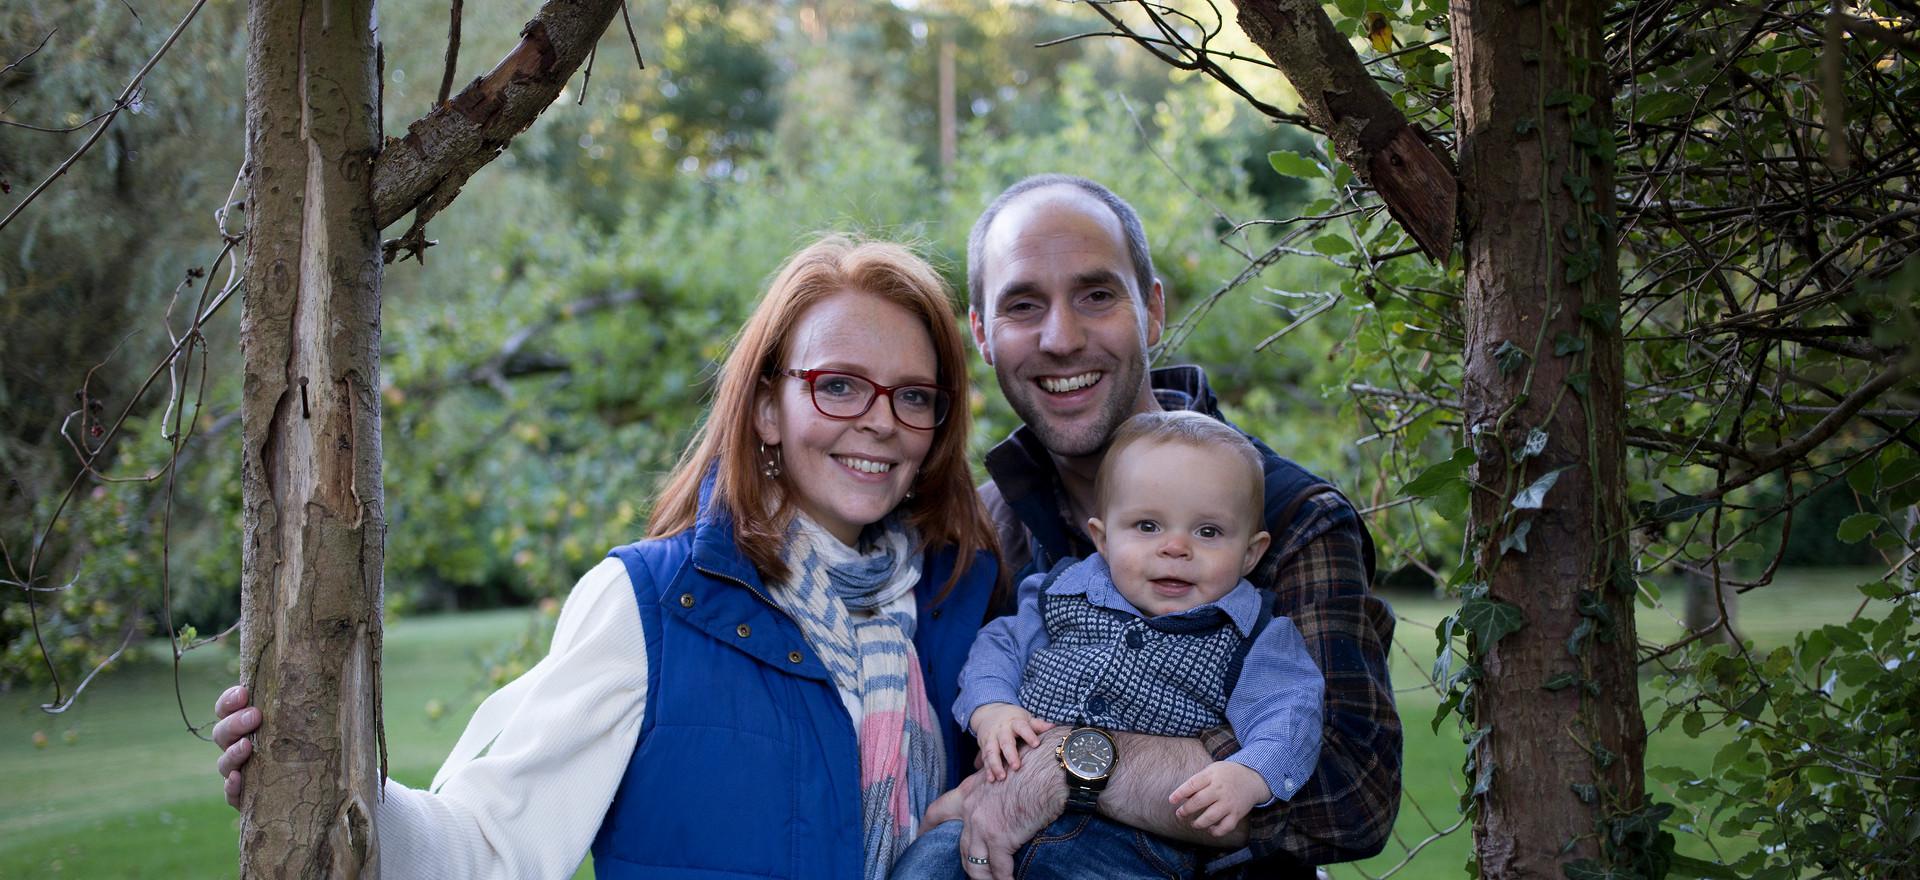 family photoshoot, wall art, newcastle family photographer, durham family photographer, outdoor family photographer